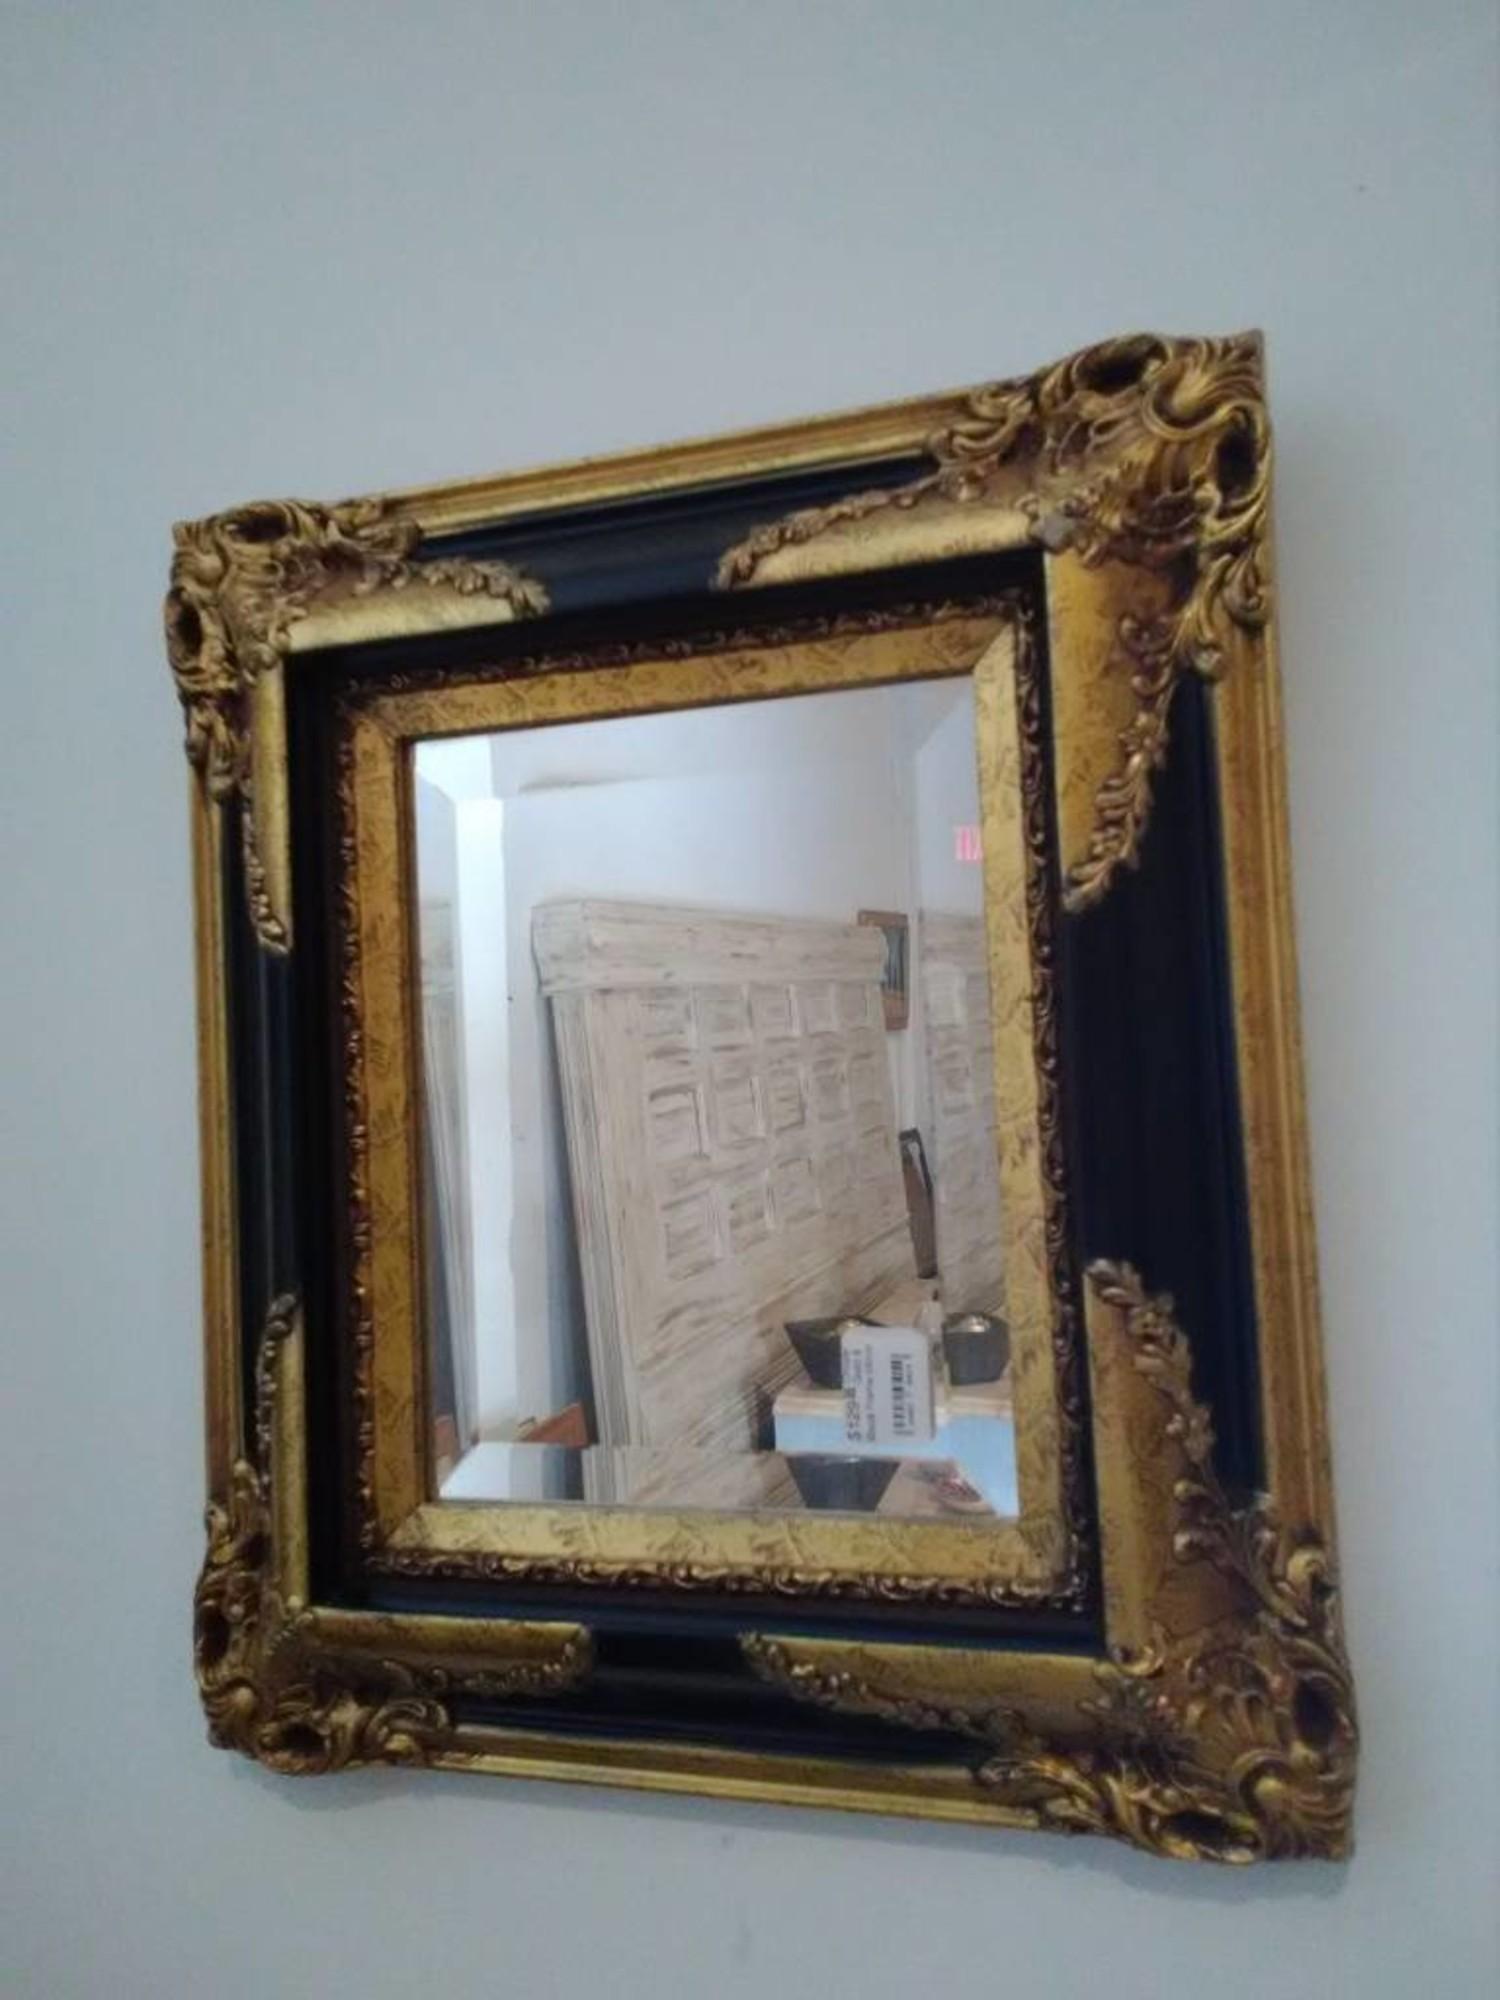 Ornate Gold Black Frame Mirror Sarasota Architectural Salvage 1093 Central Ave Sarasota Fl 34236